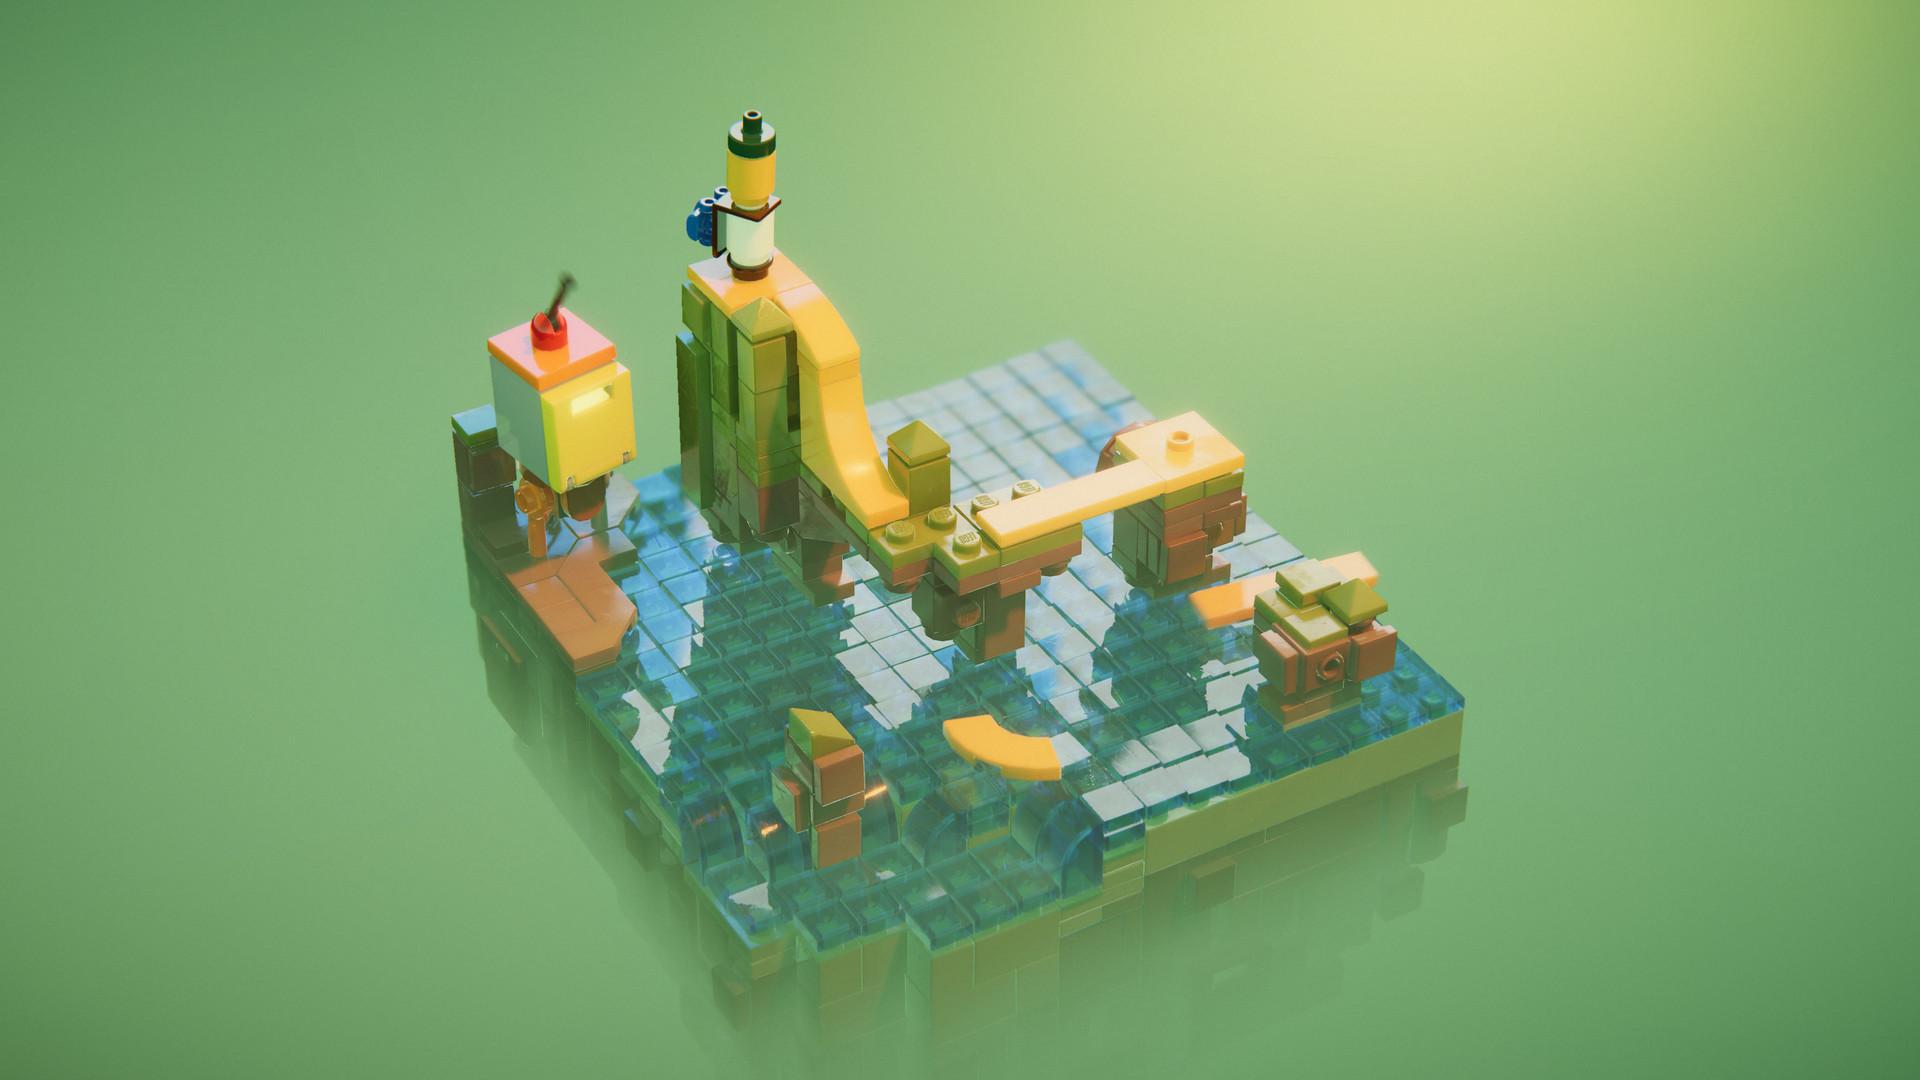 Tecnologia Ray Tracing encanta em LEGO Builder's Journey